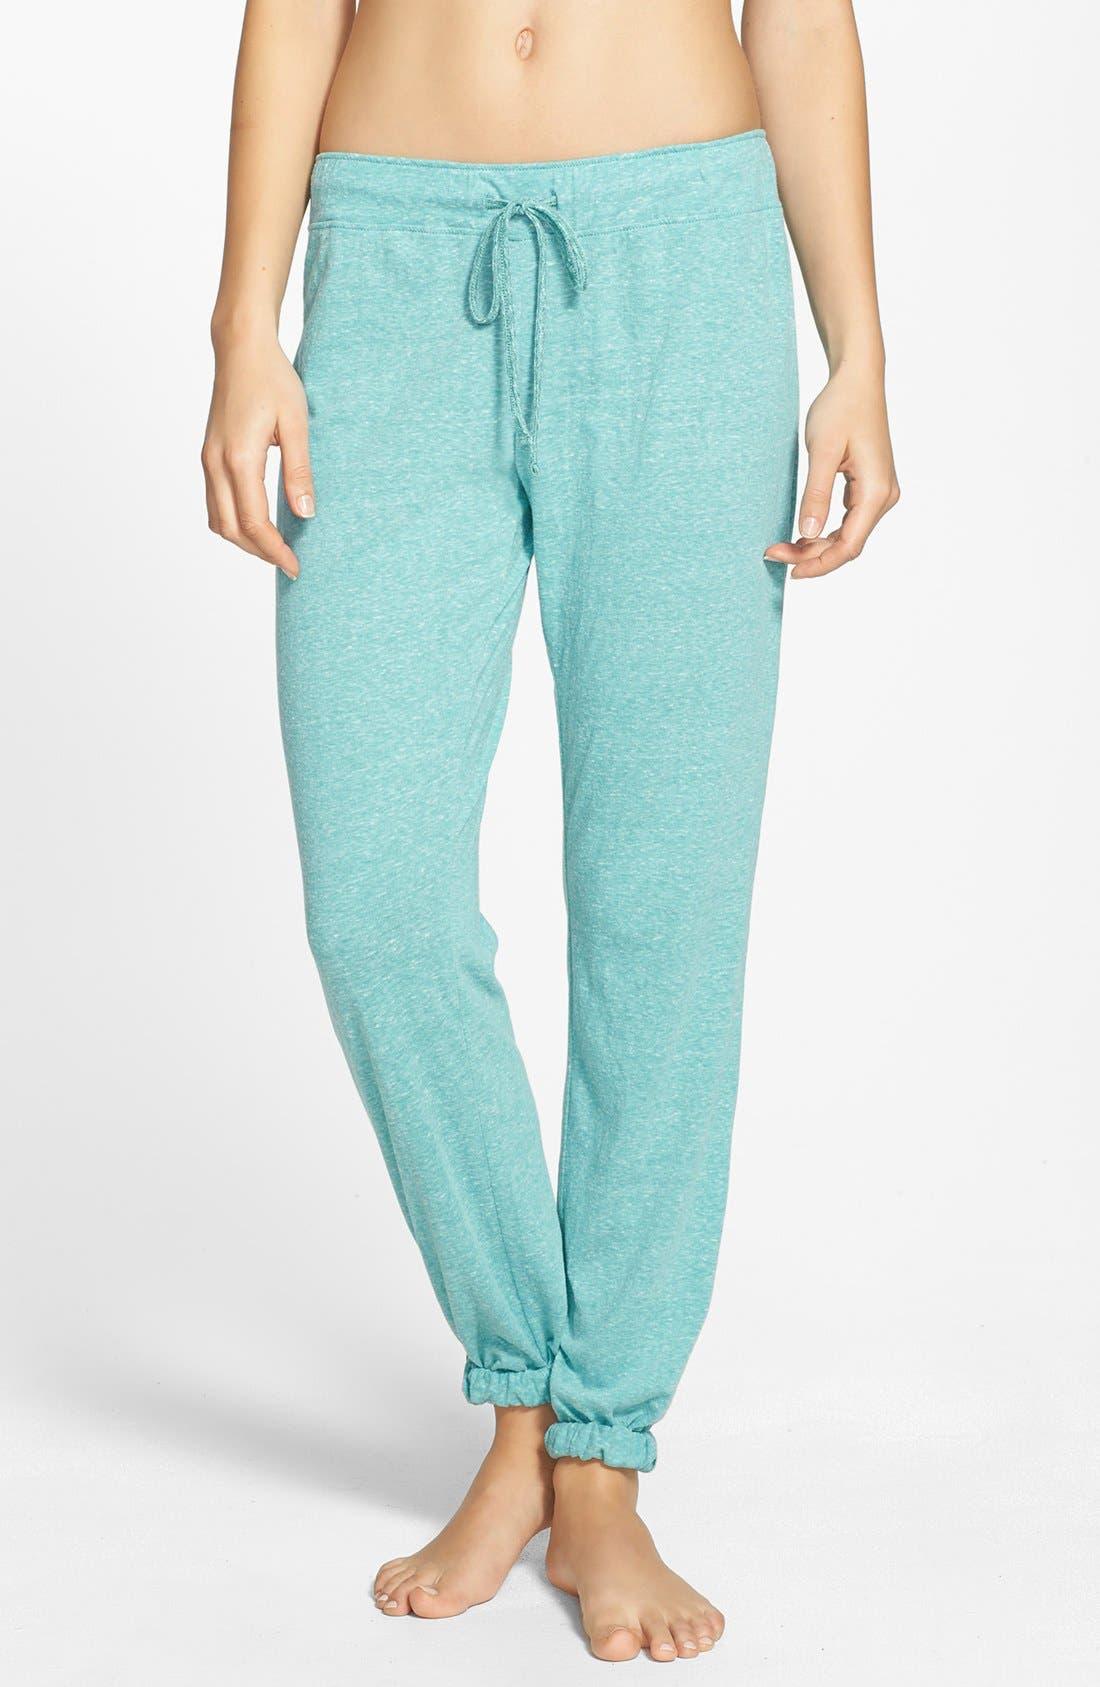 Alternate Image 1 Selected - Make + Model 'Sweet Thing Jogger' Sweatpants